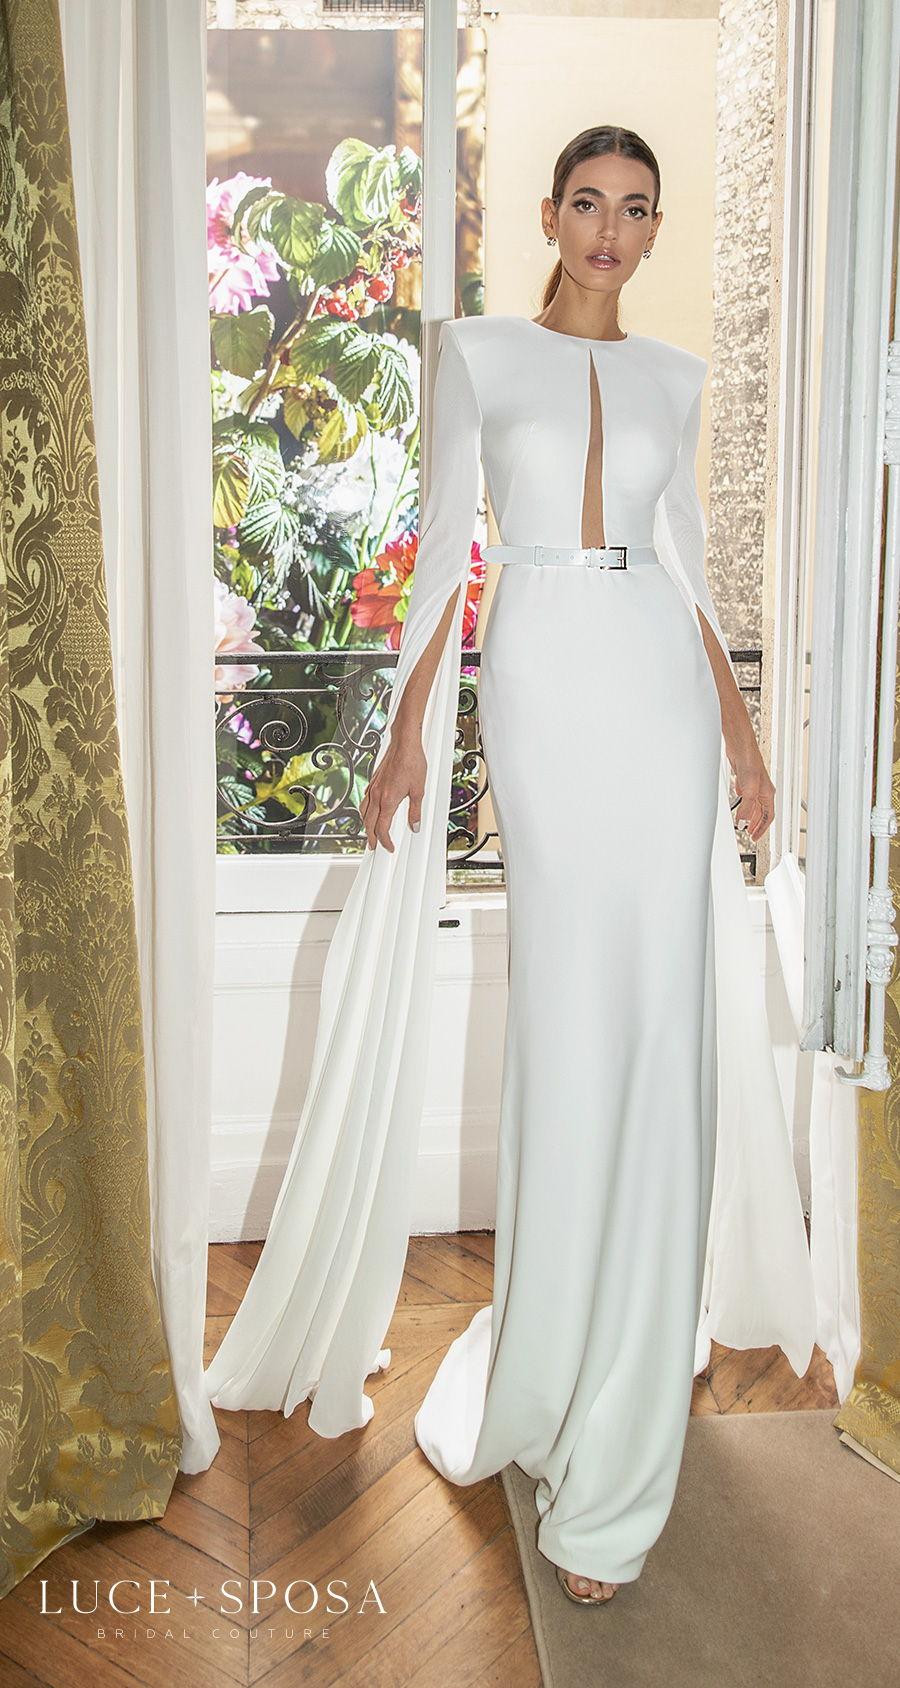 luce sposa s2021 paris bridal long hanging sleeves jewel neck slit bodice minimalist chic modern sheath wedding dress covered back short train (patty) mv